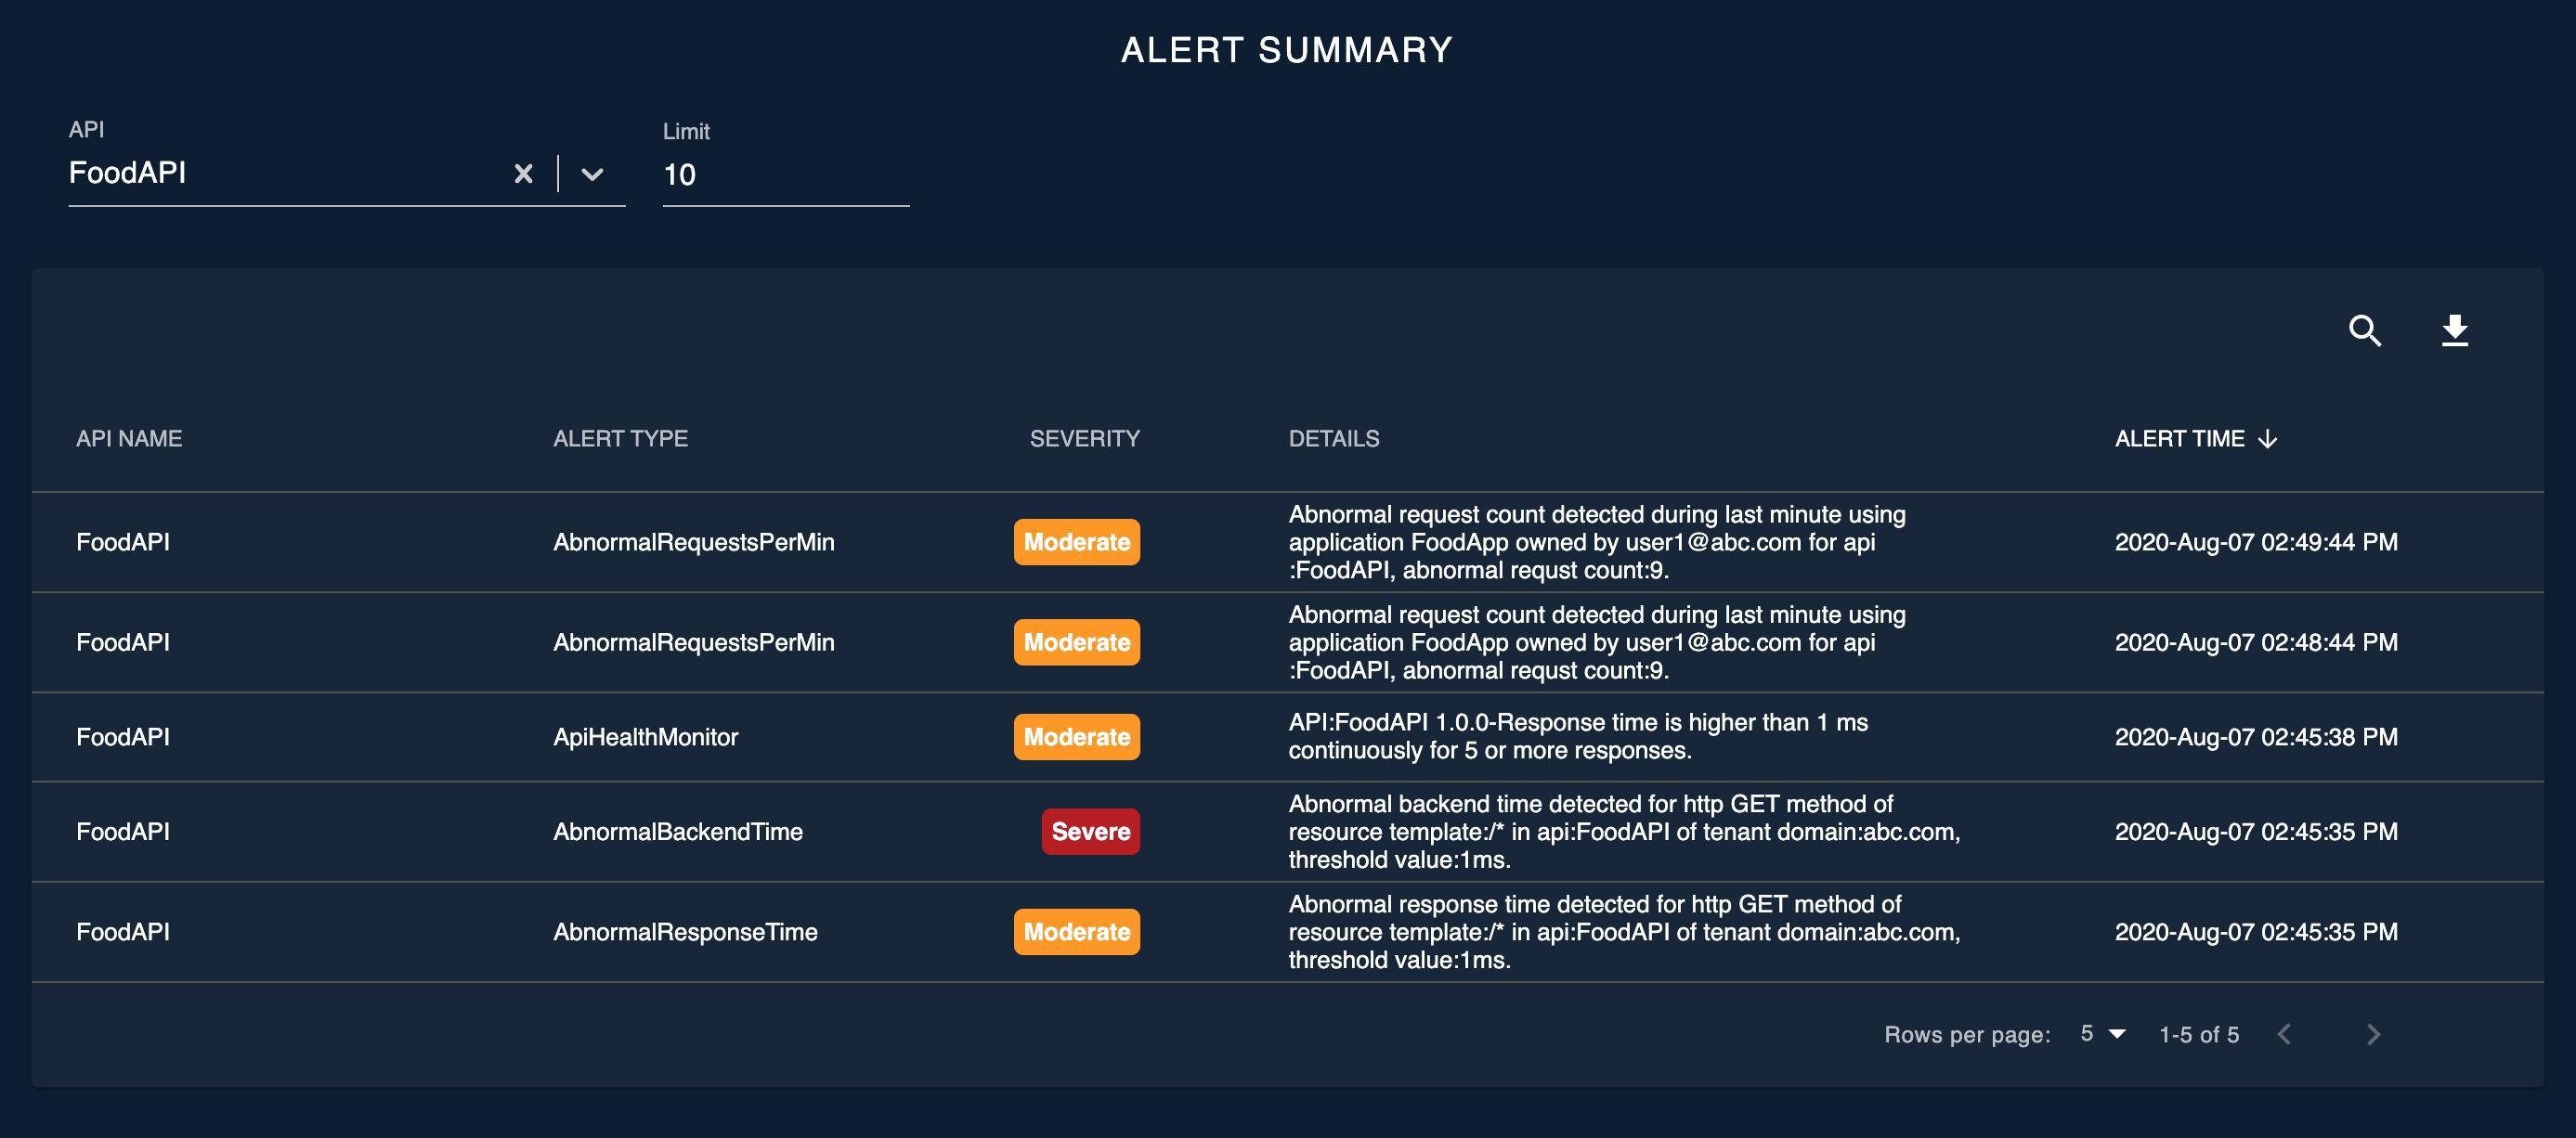 Alert summary API